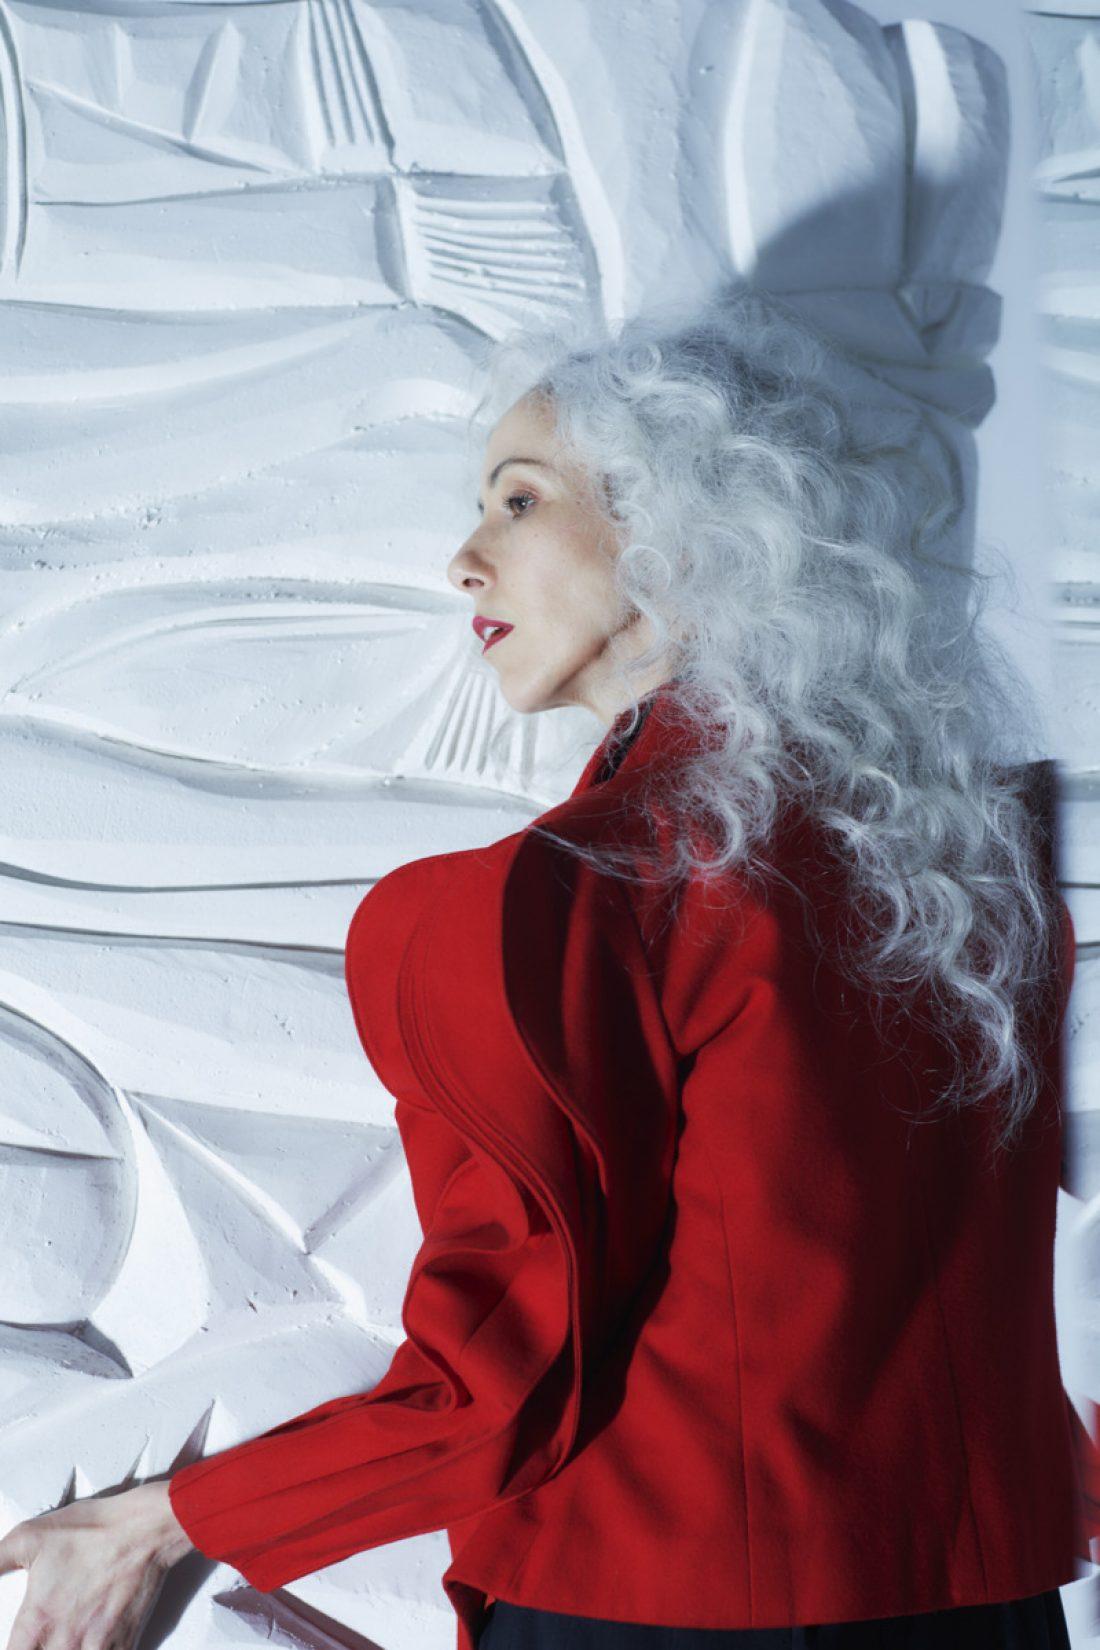 Sienna & Darya for Her Magazine | Photography: Toaki Okano | Art Direction & Styling: Darya Bing, Nikki @particularparticular | Hair: Phillippa Hofman | Beauty: Angela Stewart Makeup